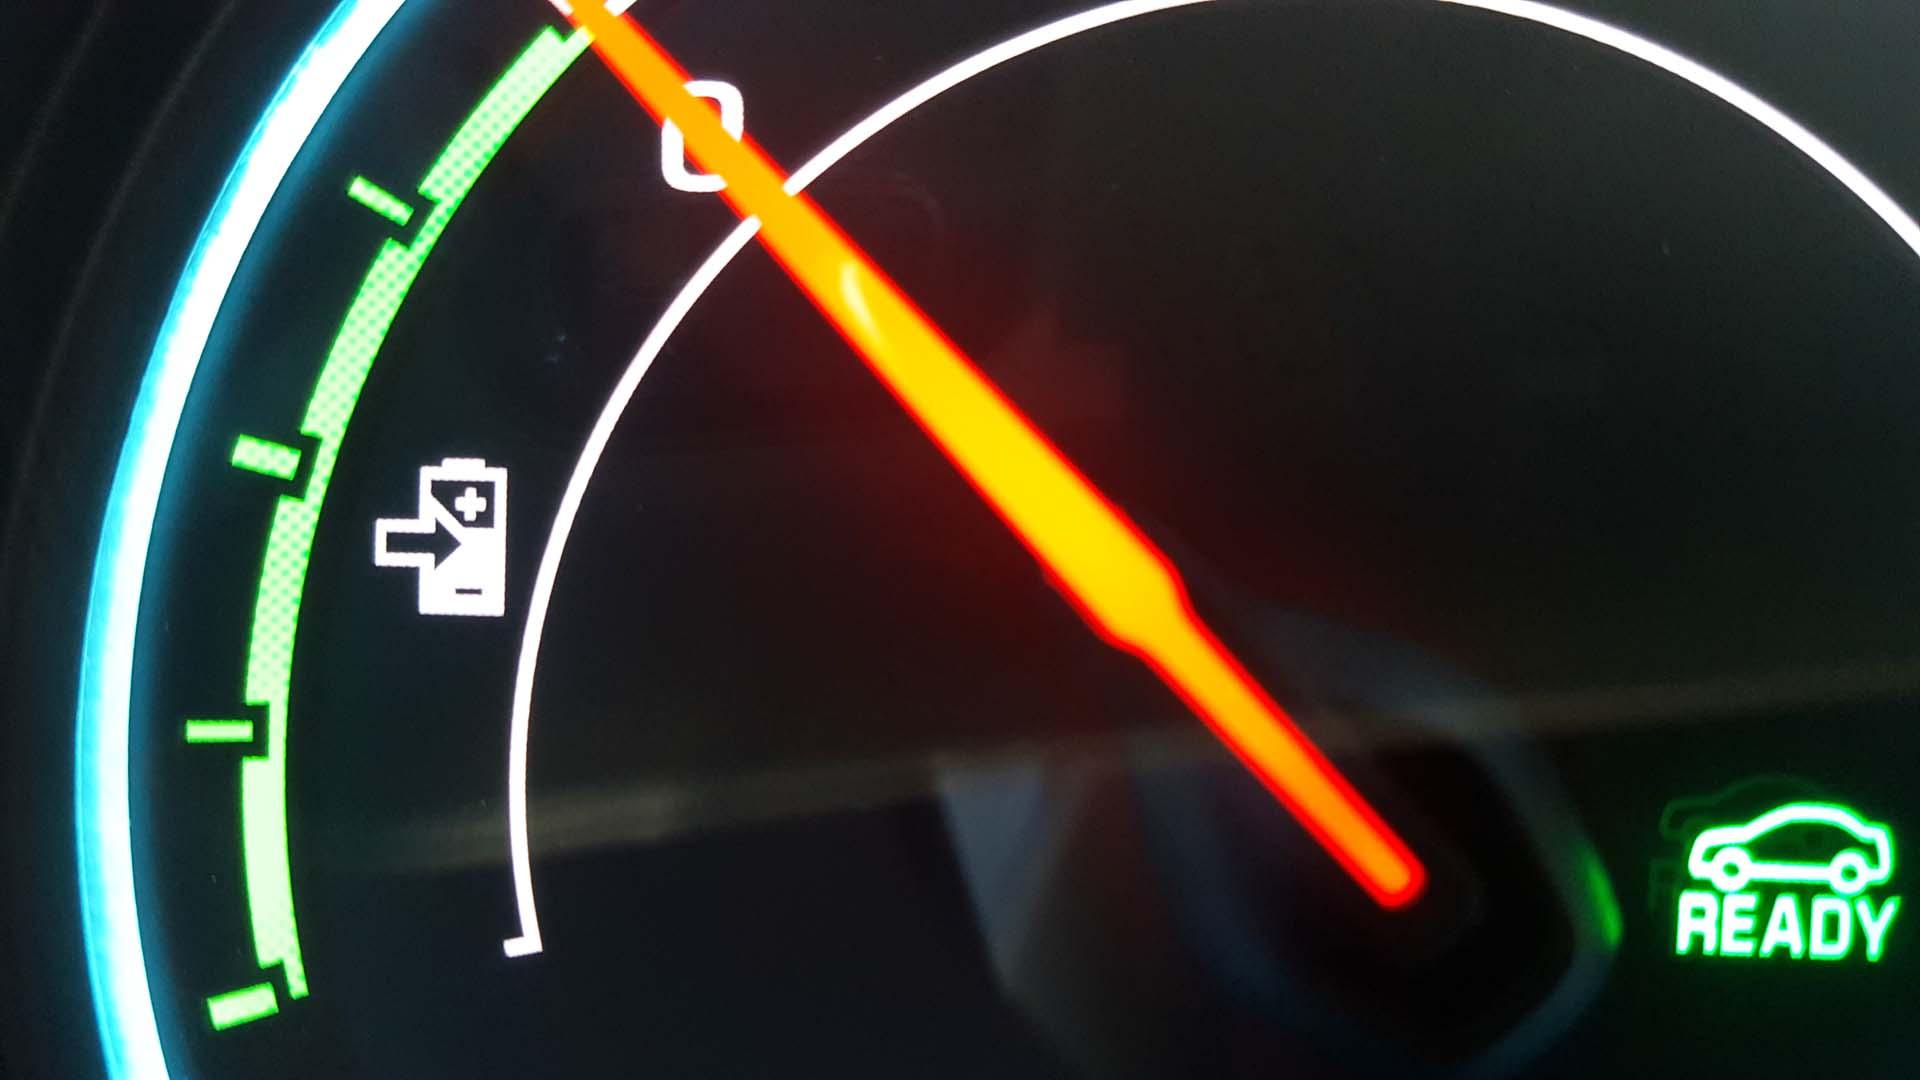 regenerative braking meter